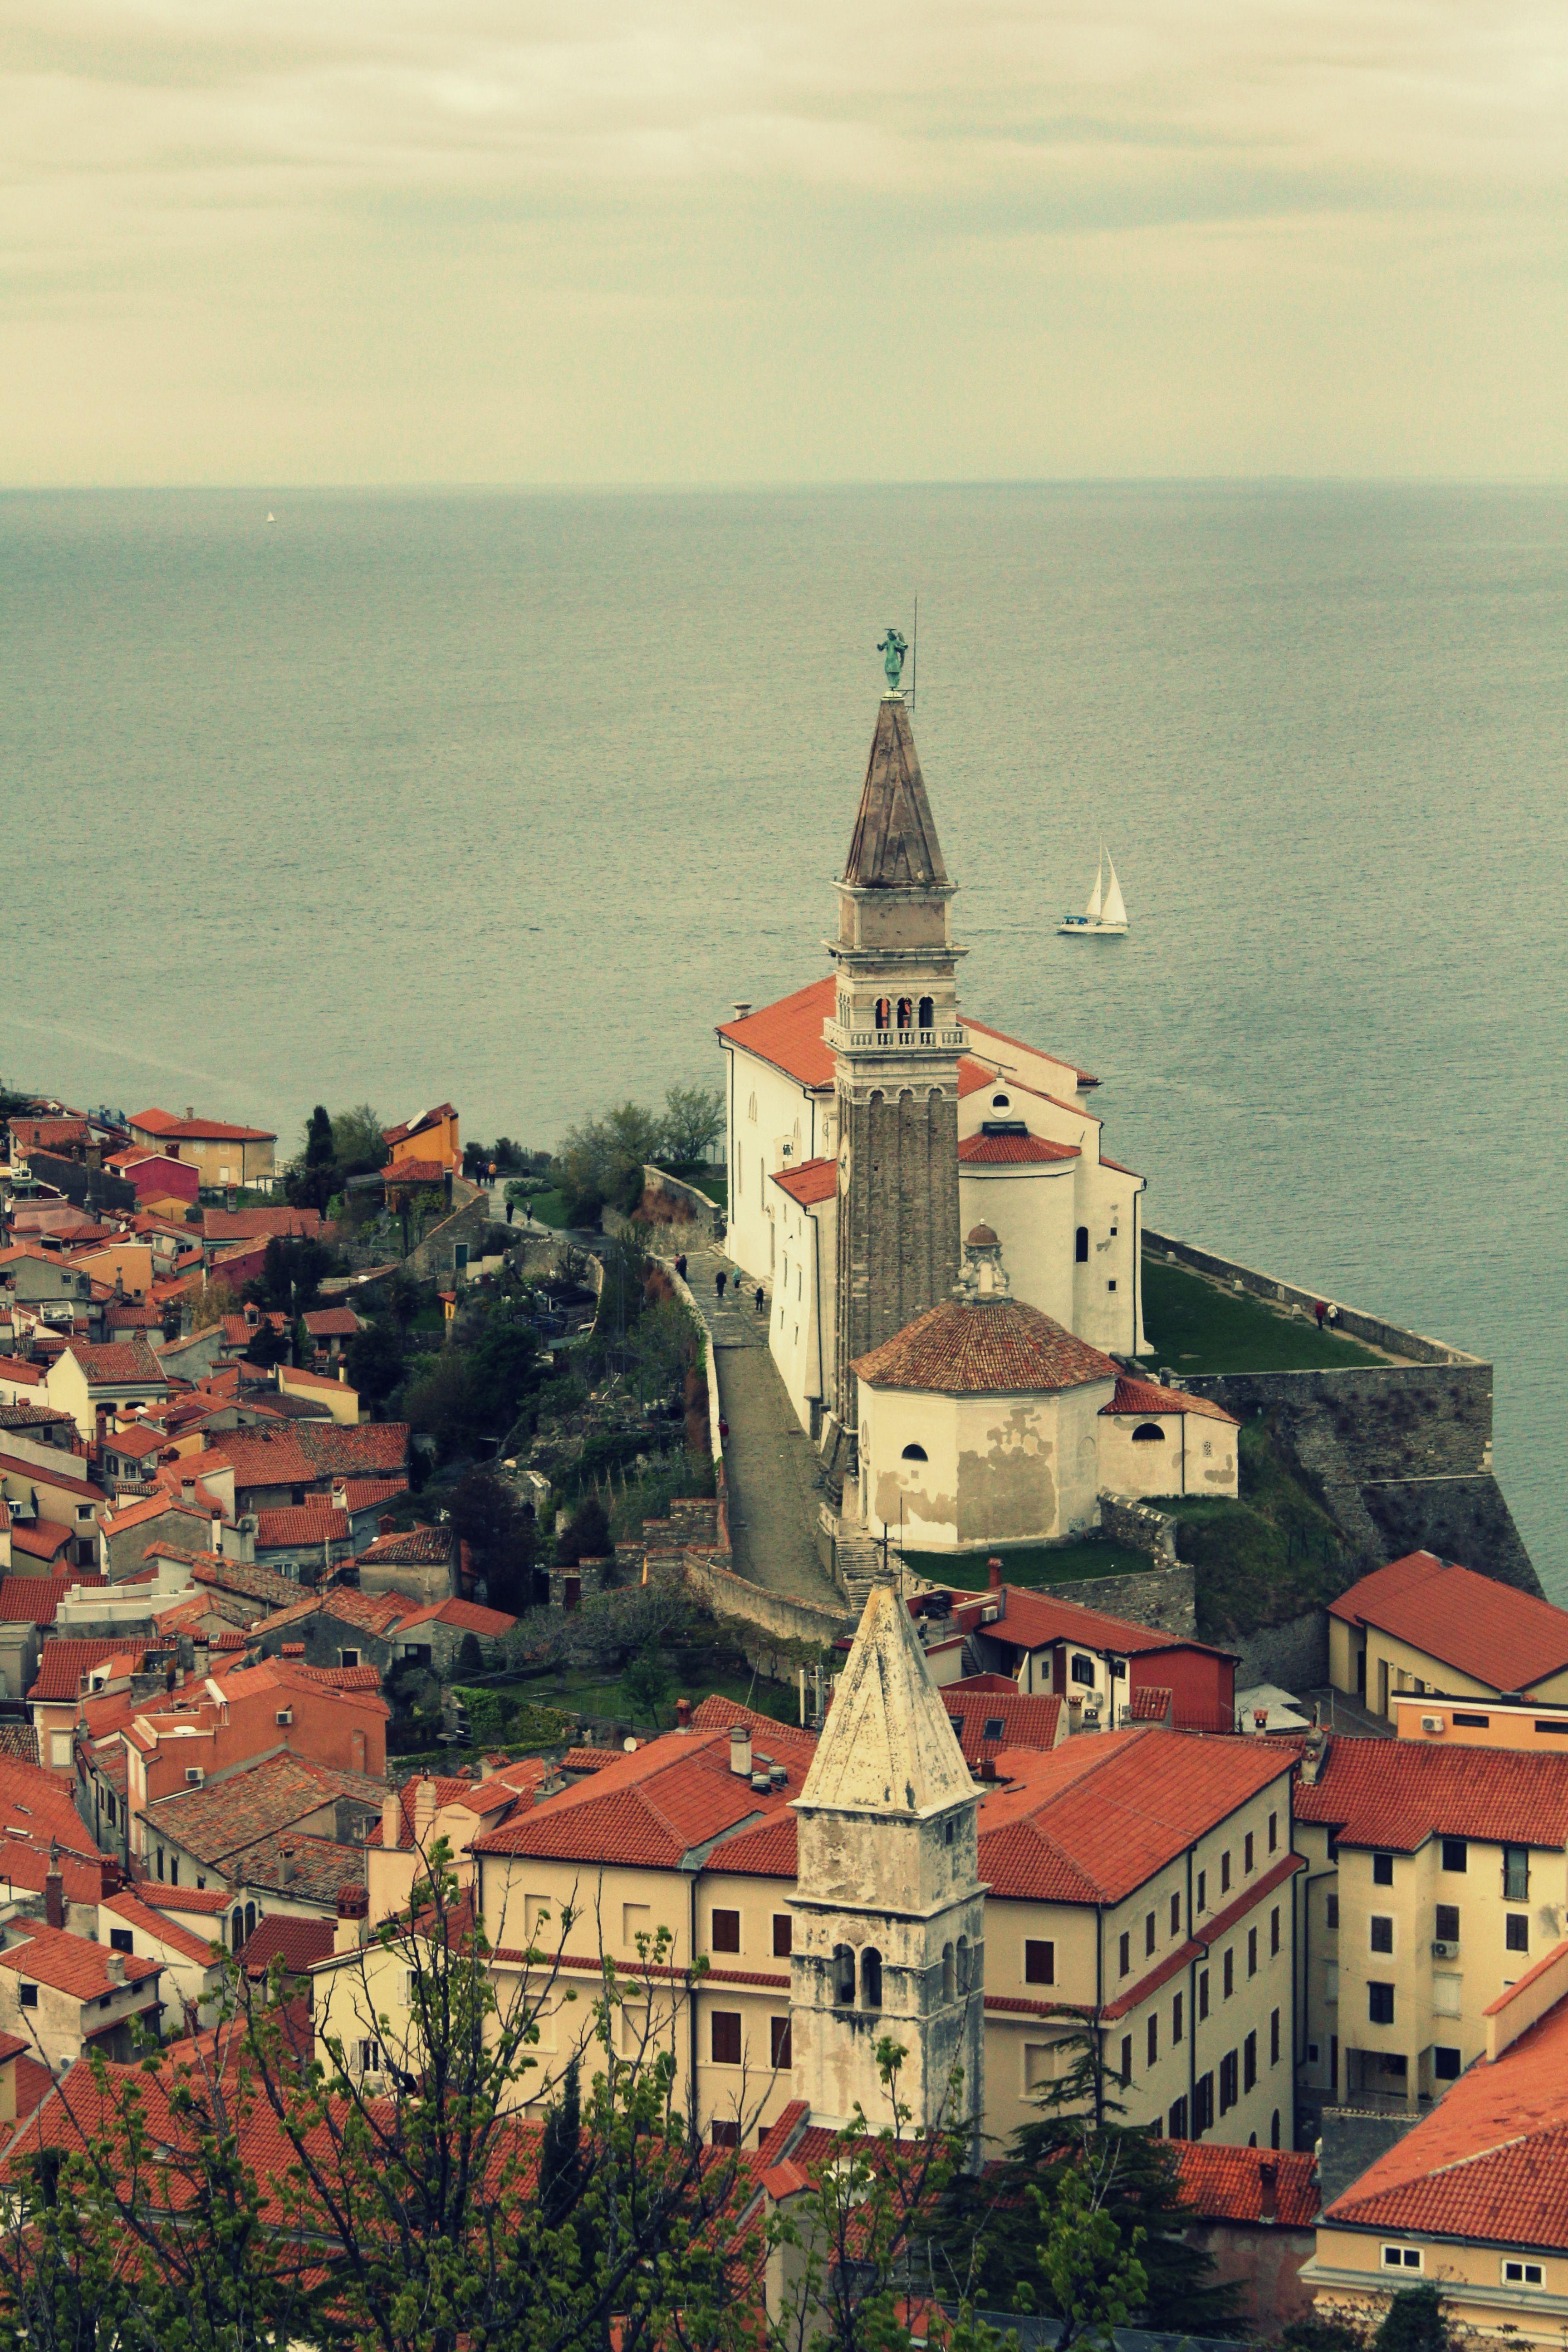 St. George's Parish Church; Piran - Slovenia <3